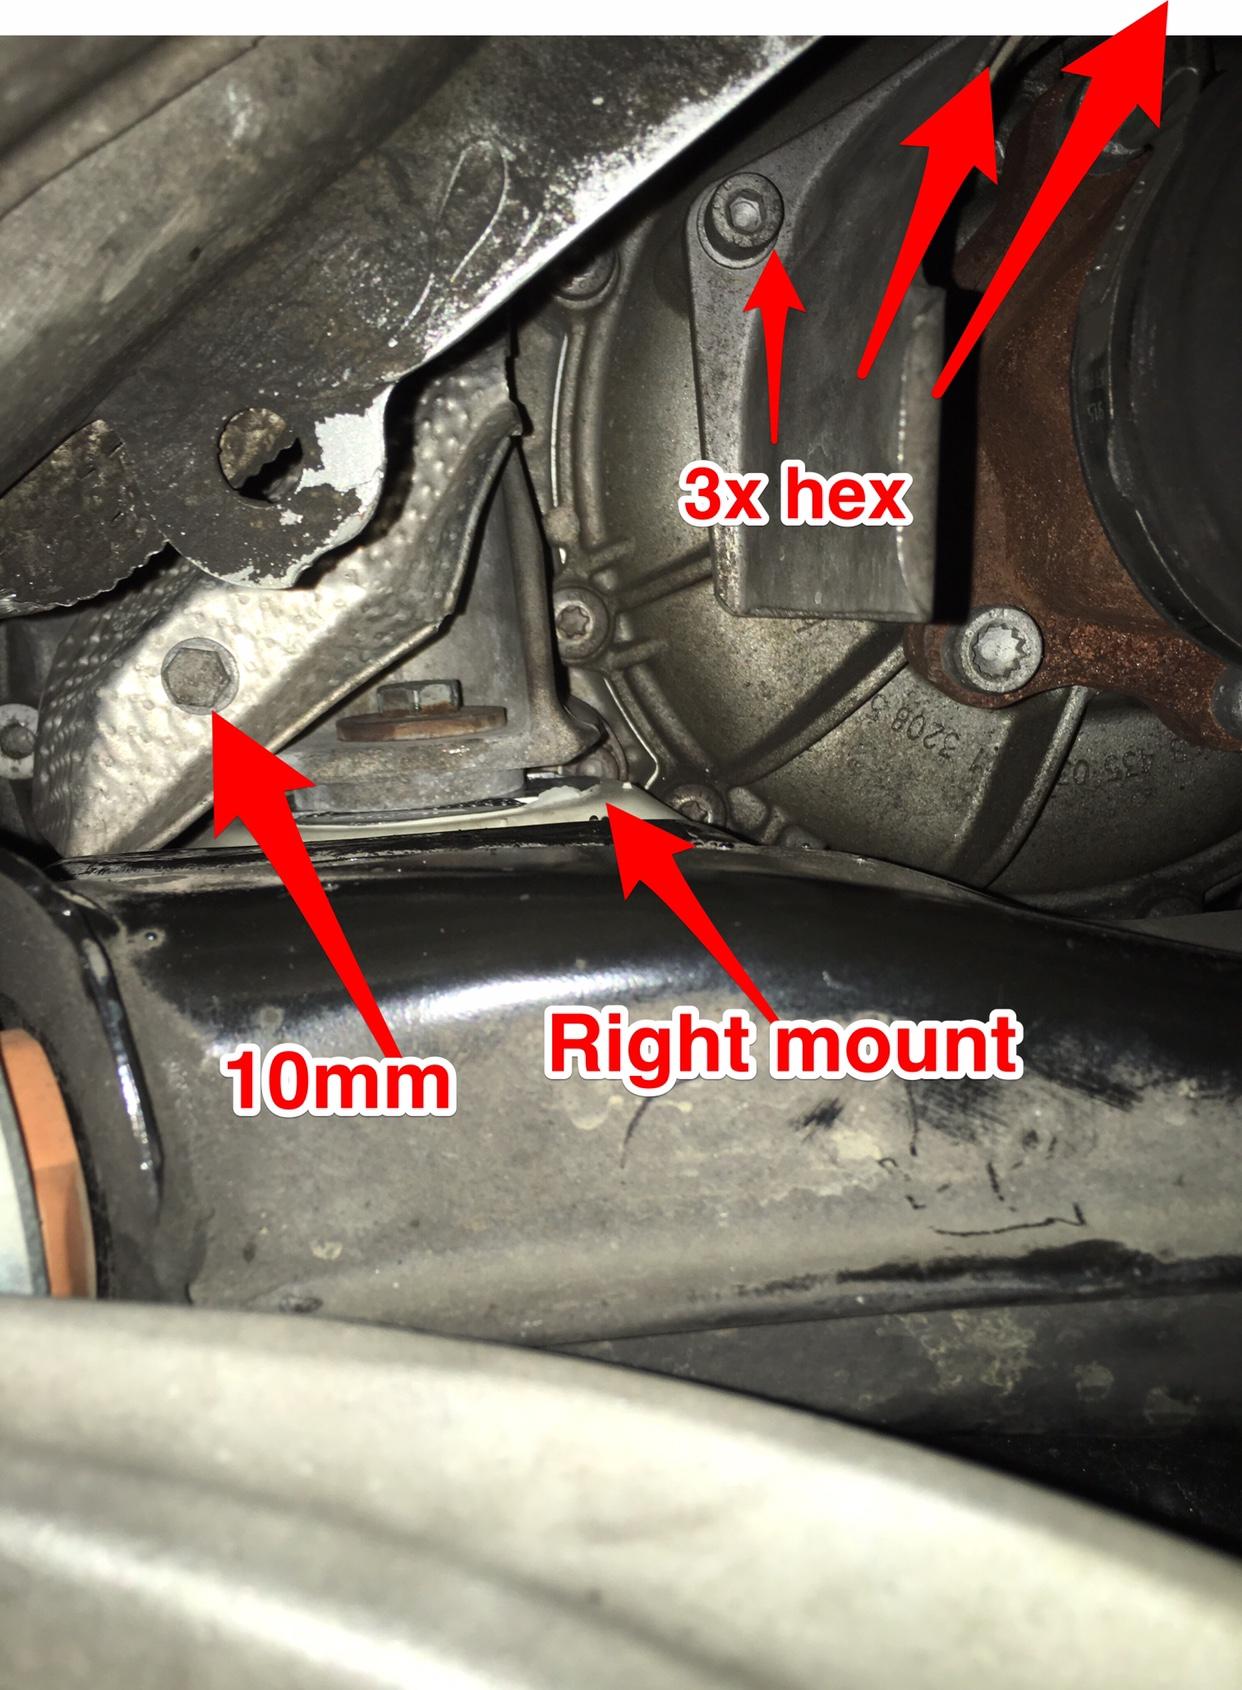 A4 B7 2 0T tiptronic transmission mounts replacement - DIY